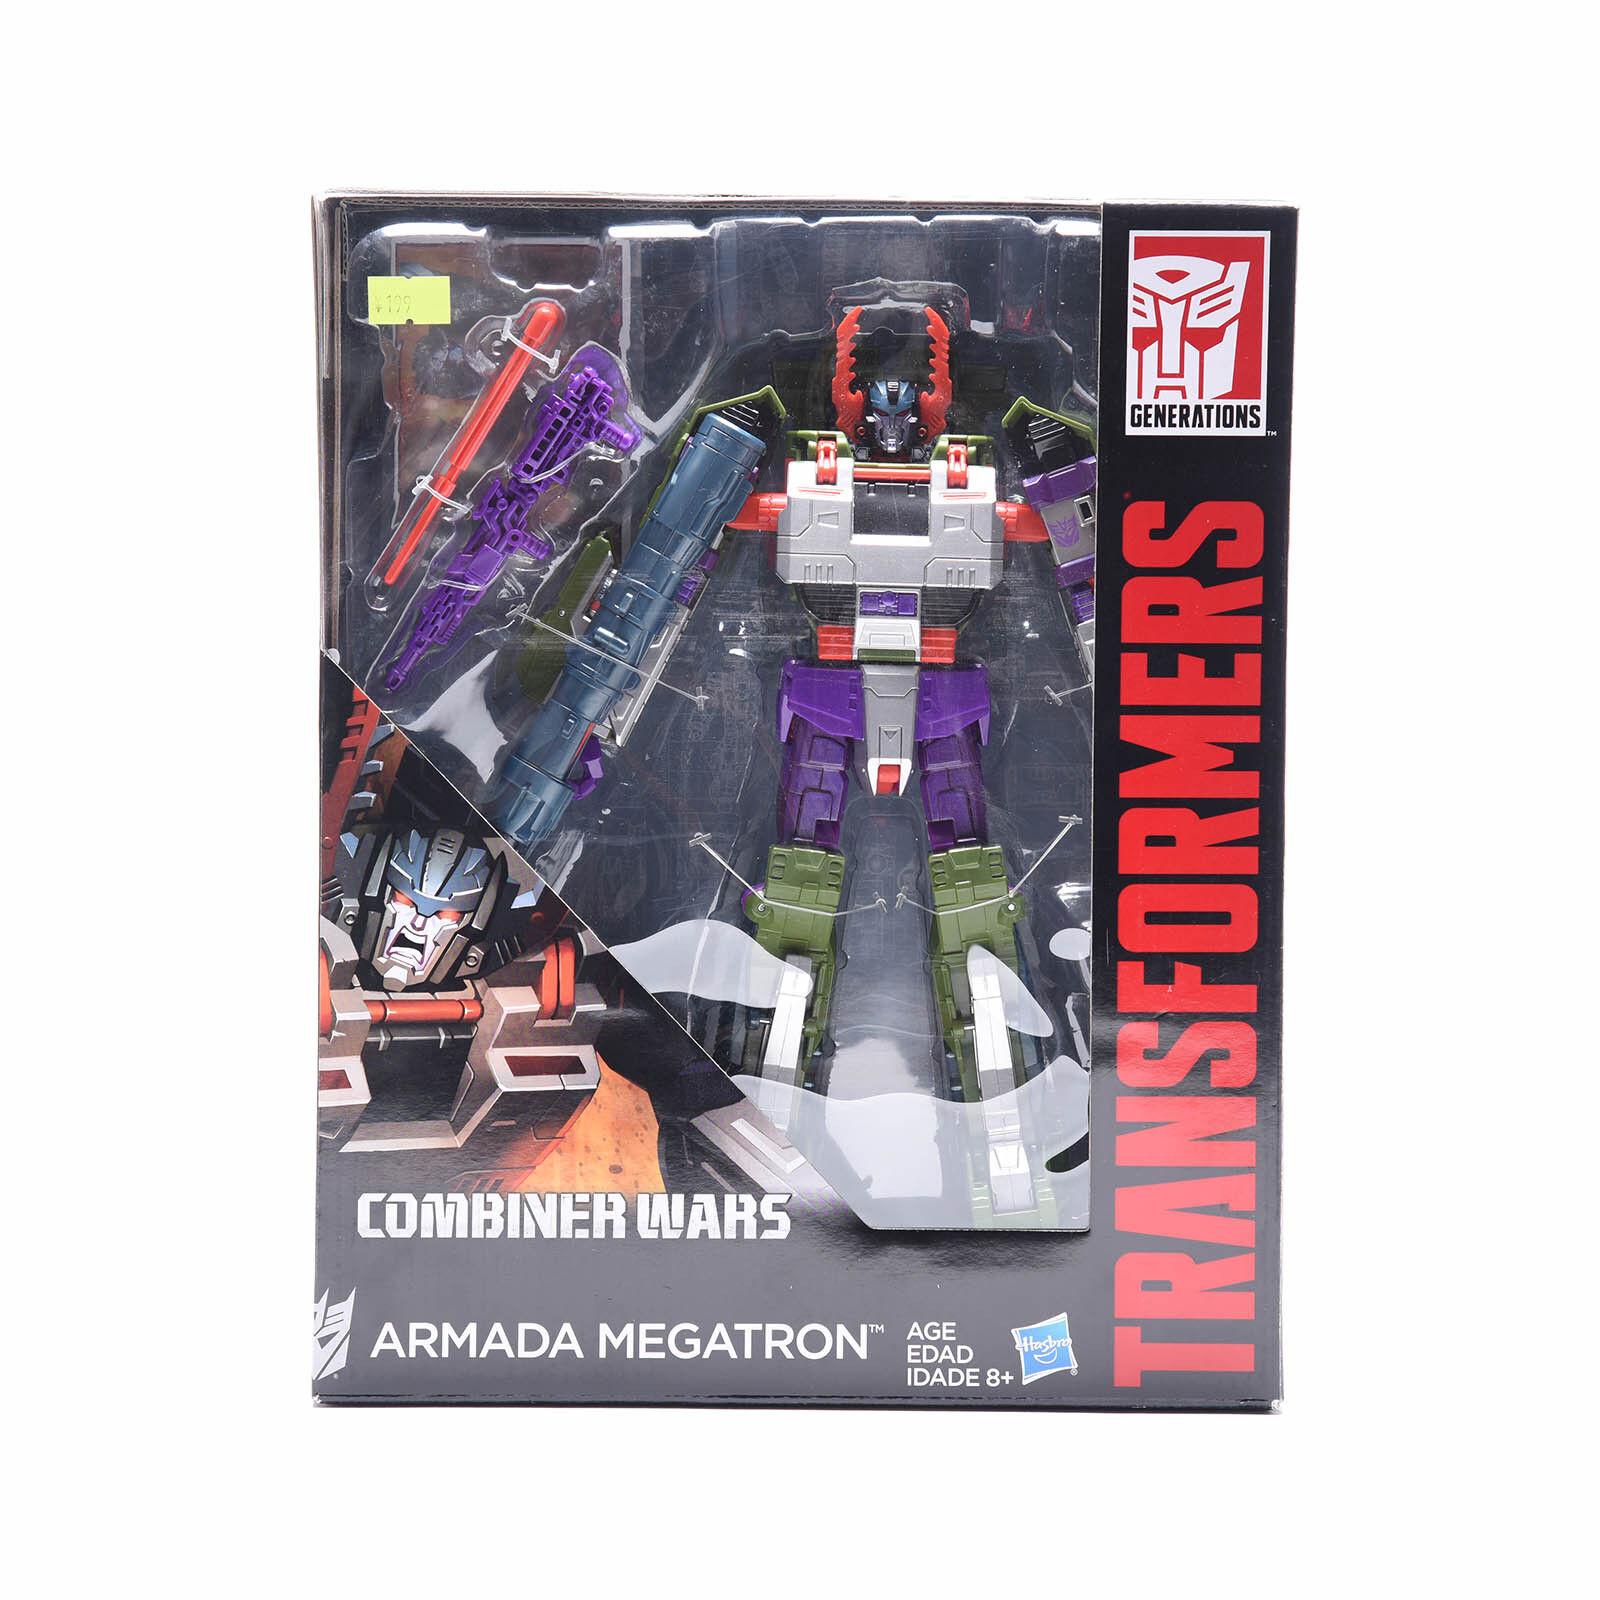 Transformers Combiner Wars Leader Class Armada Megatron Green Green Green Hot New 131e2c